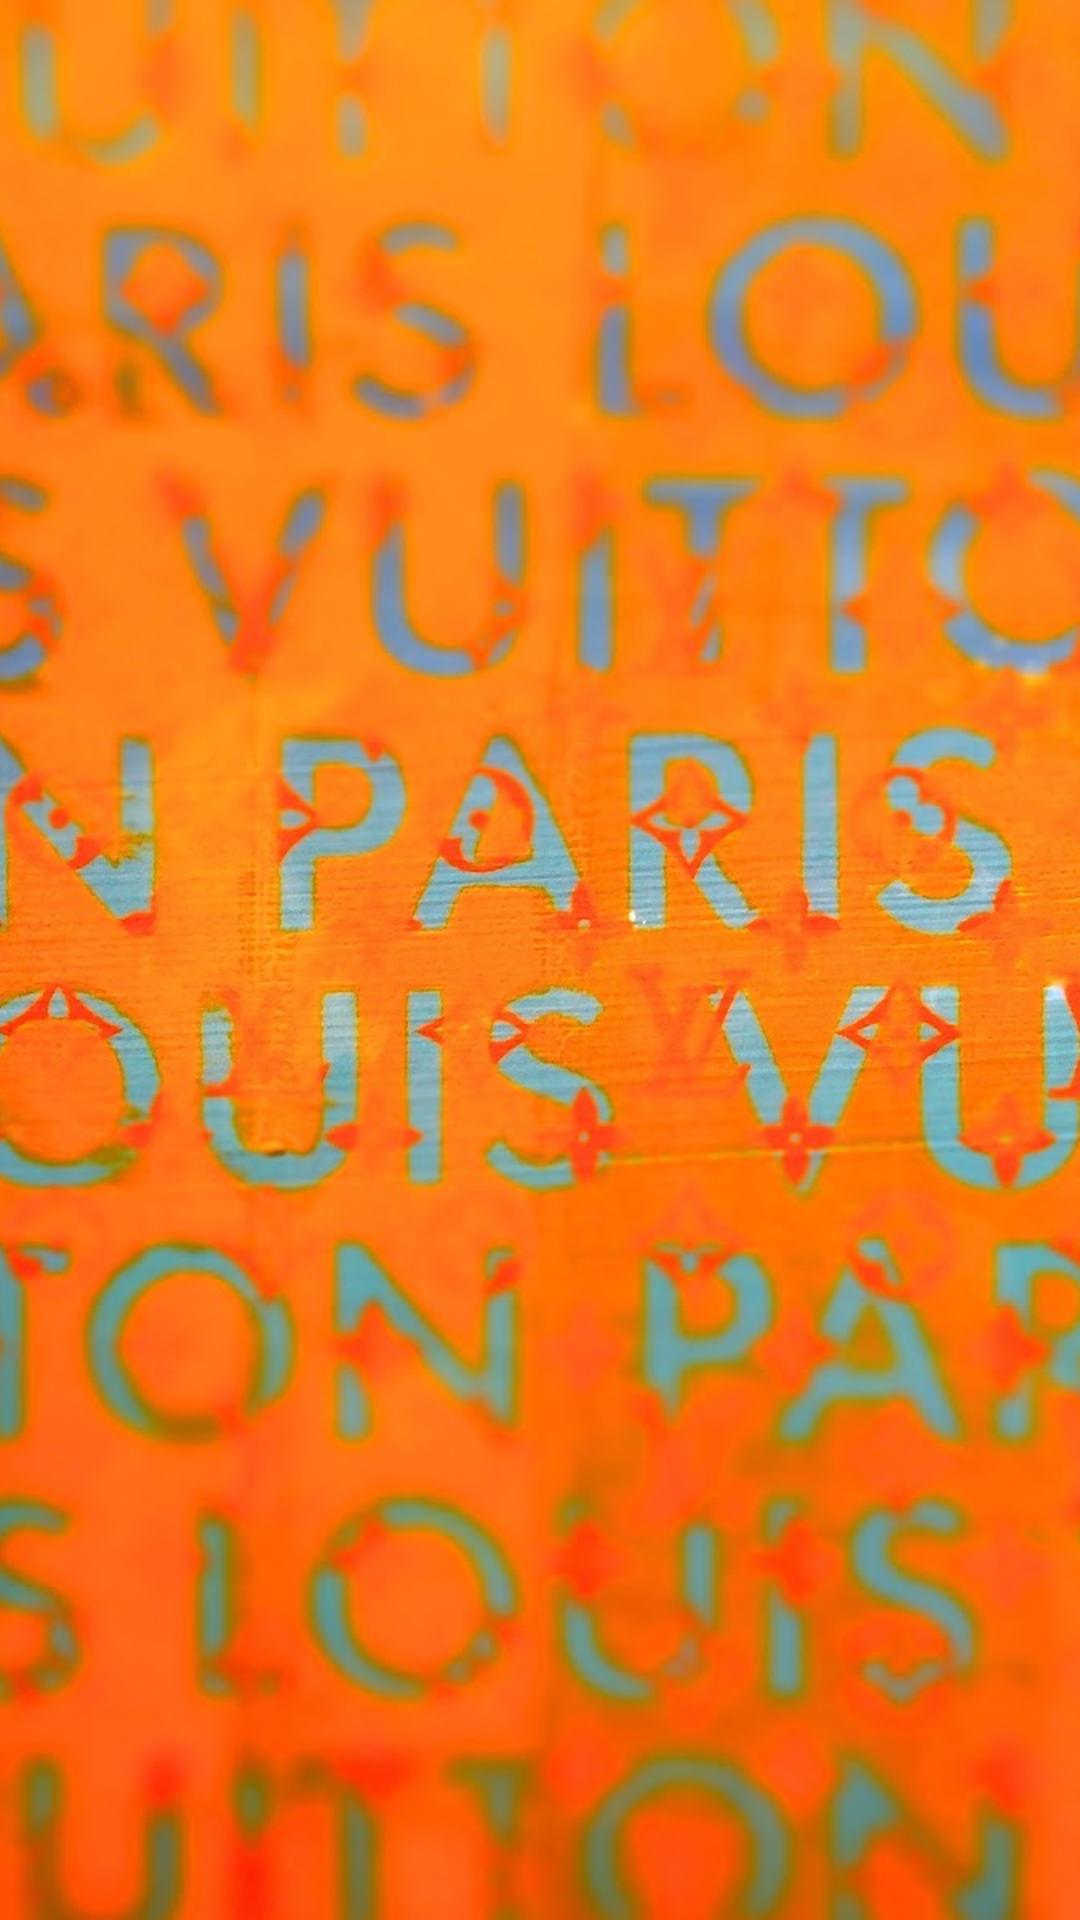 louisvuitton i10 - 20 LOUIS VUITTON HQ Smartphone Wallpaper Collection